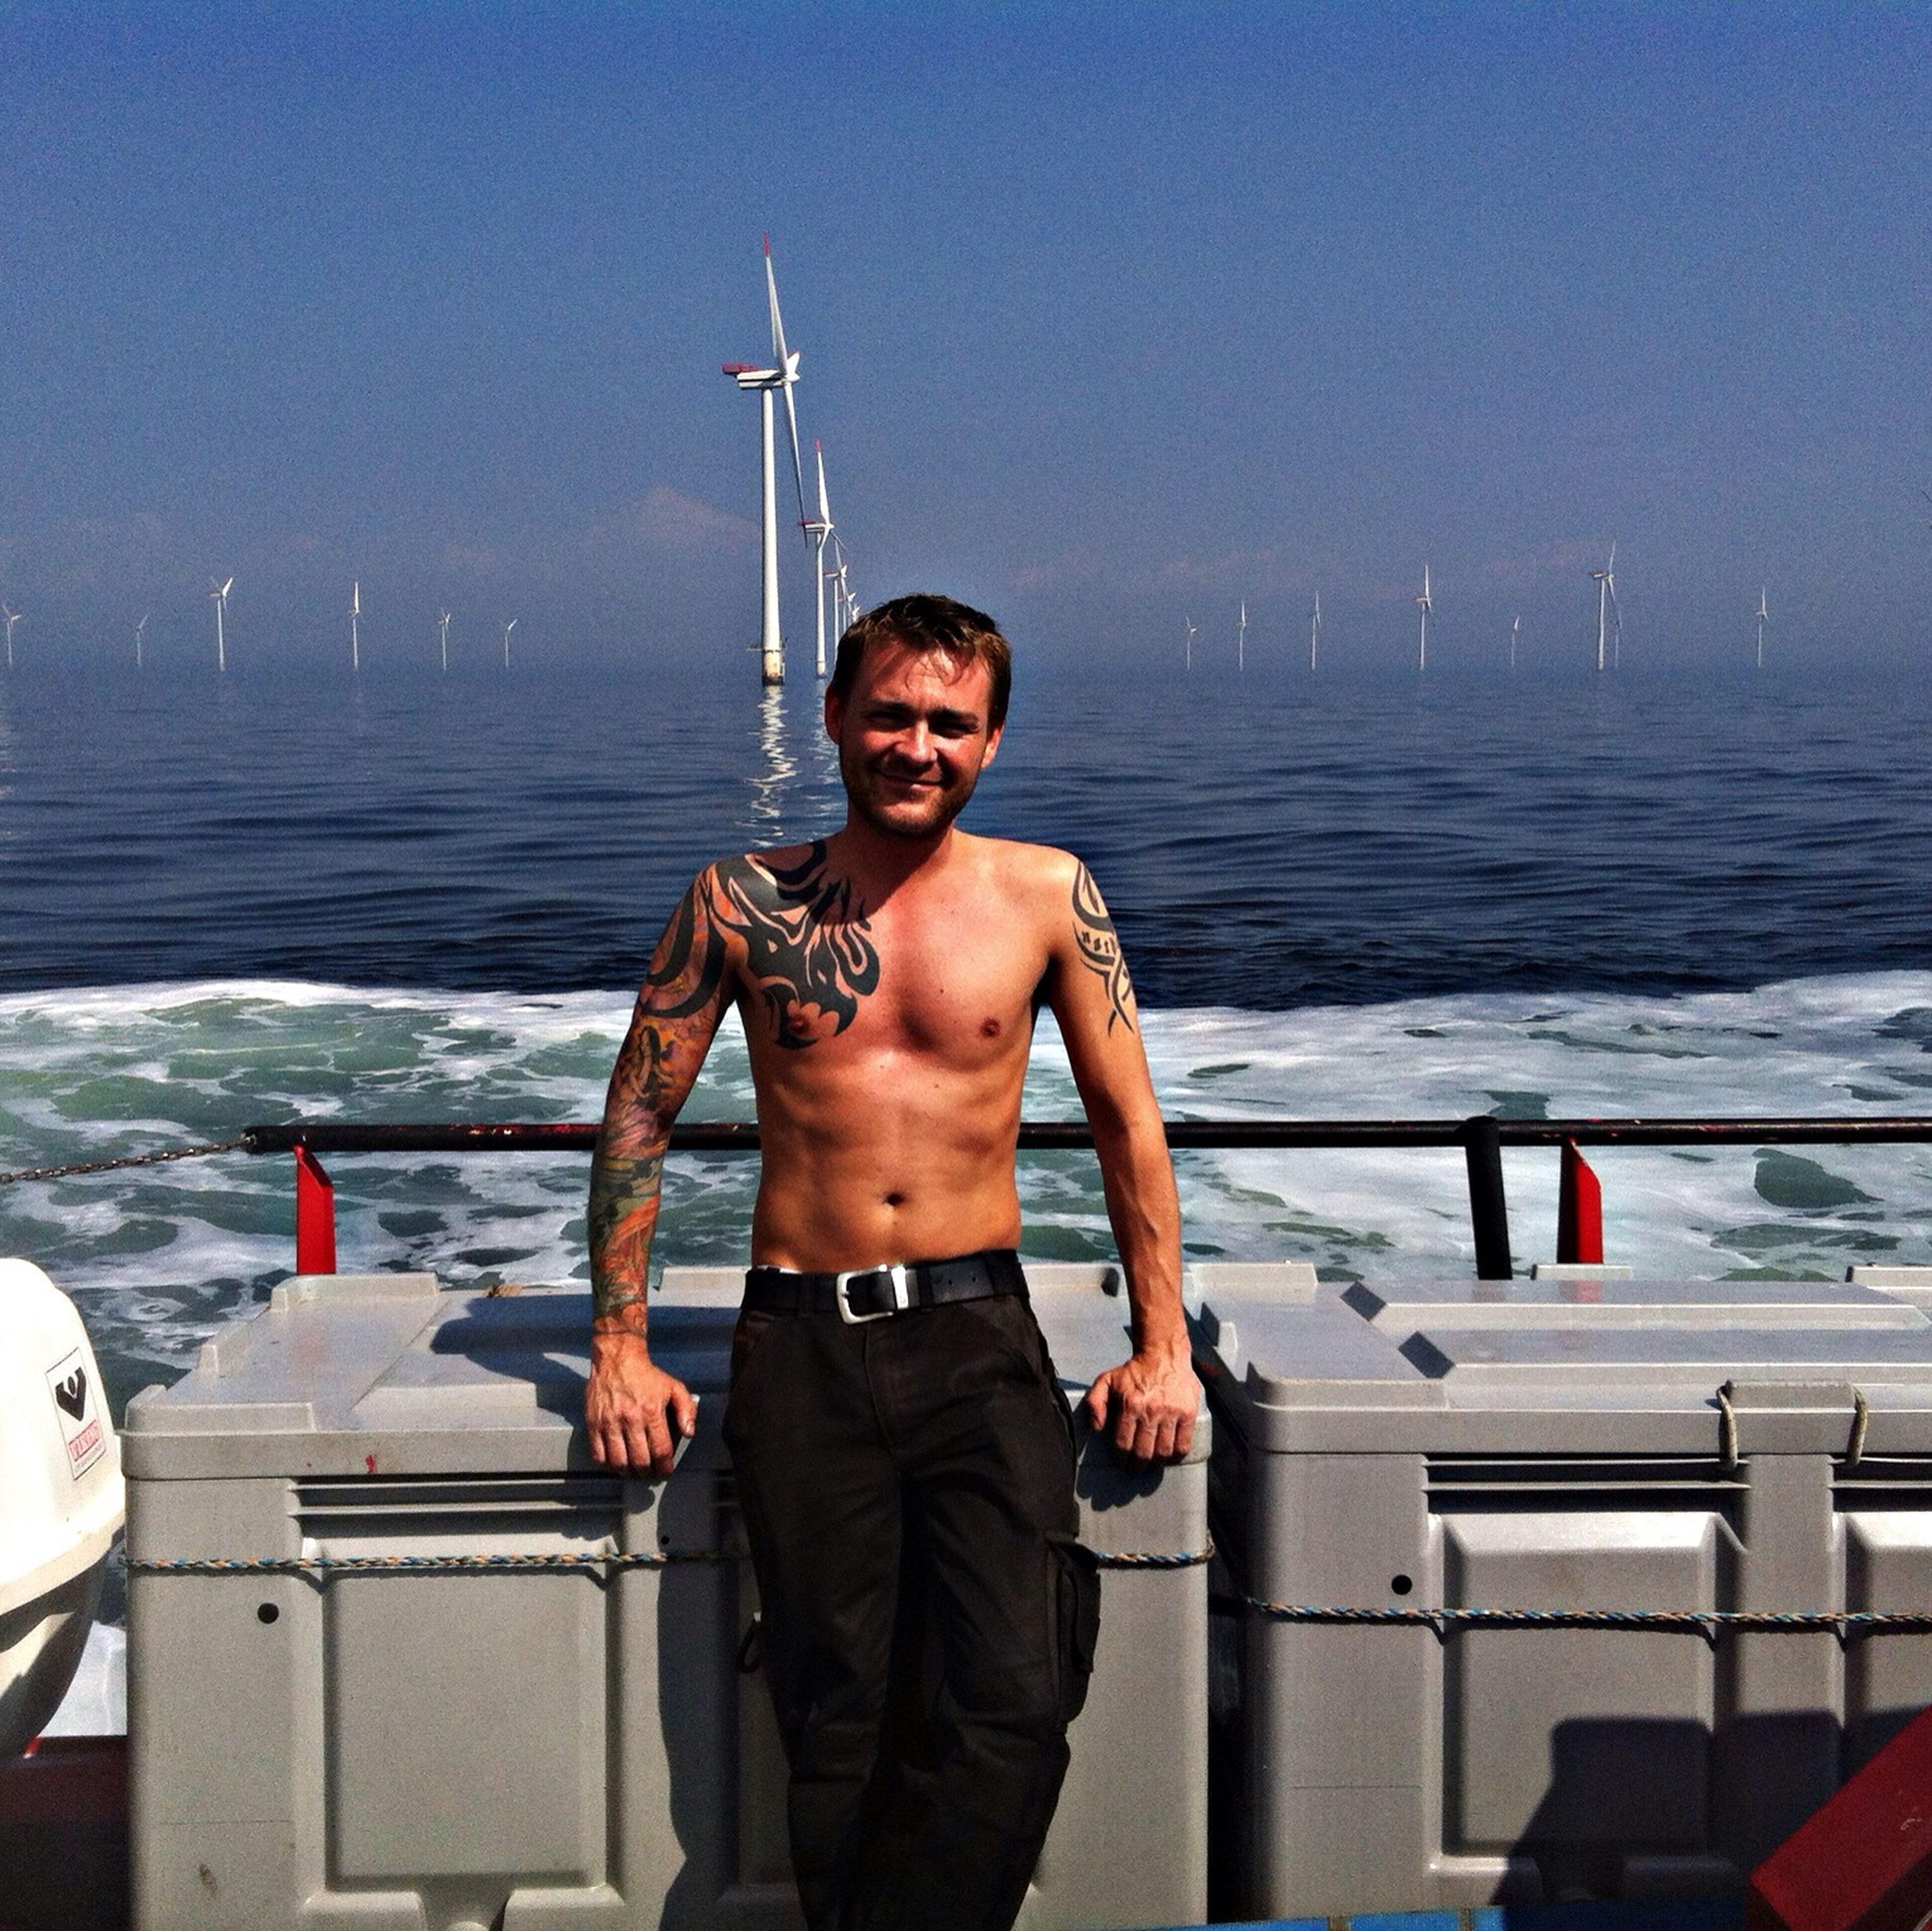 Wind Farm Offshore Hard Working